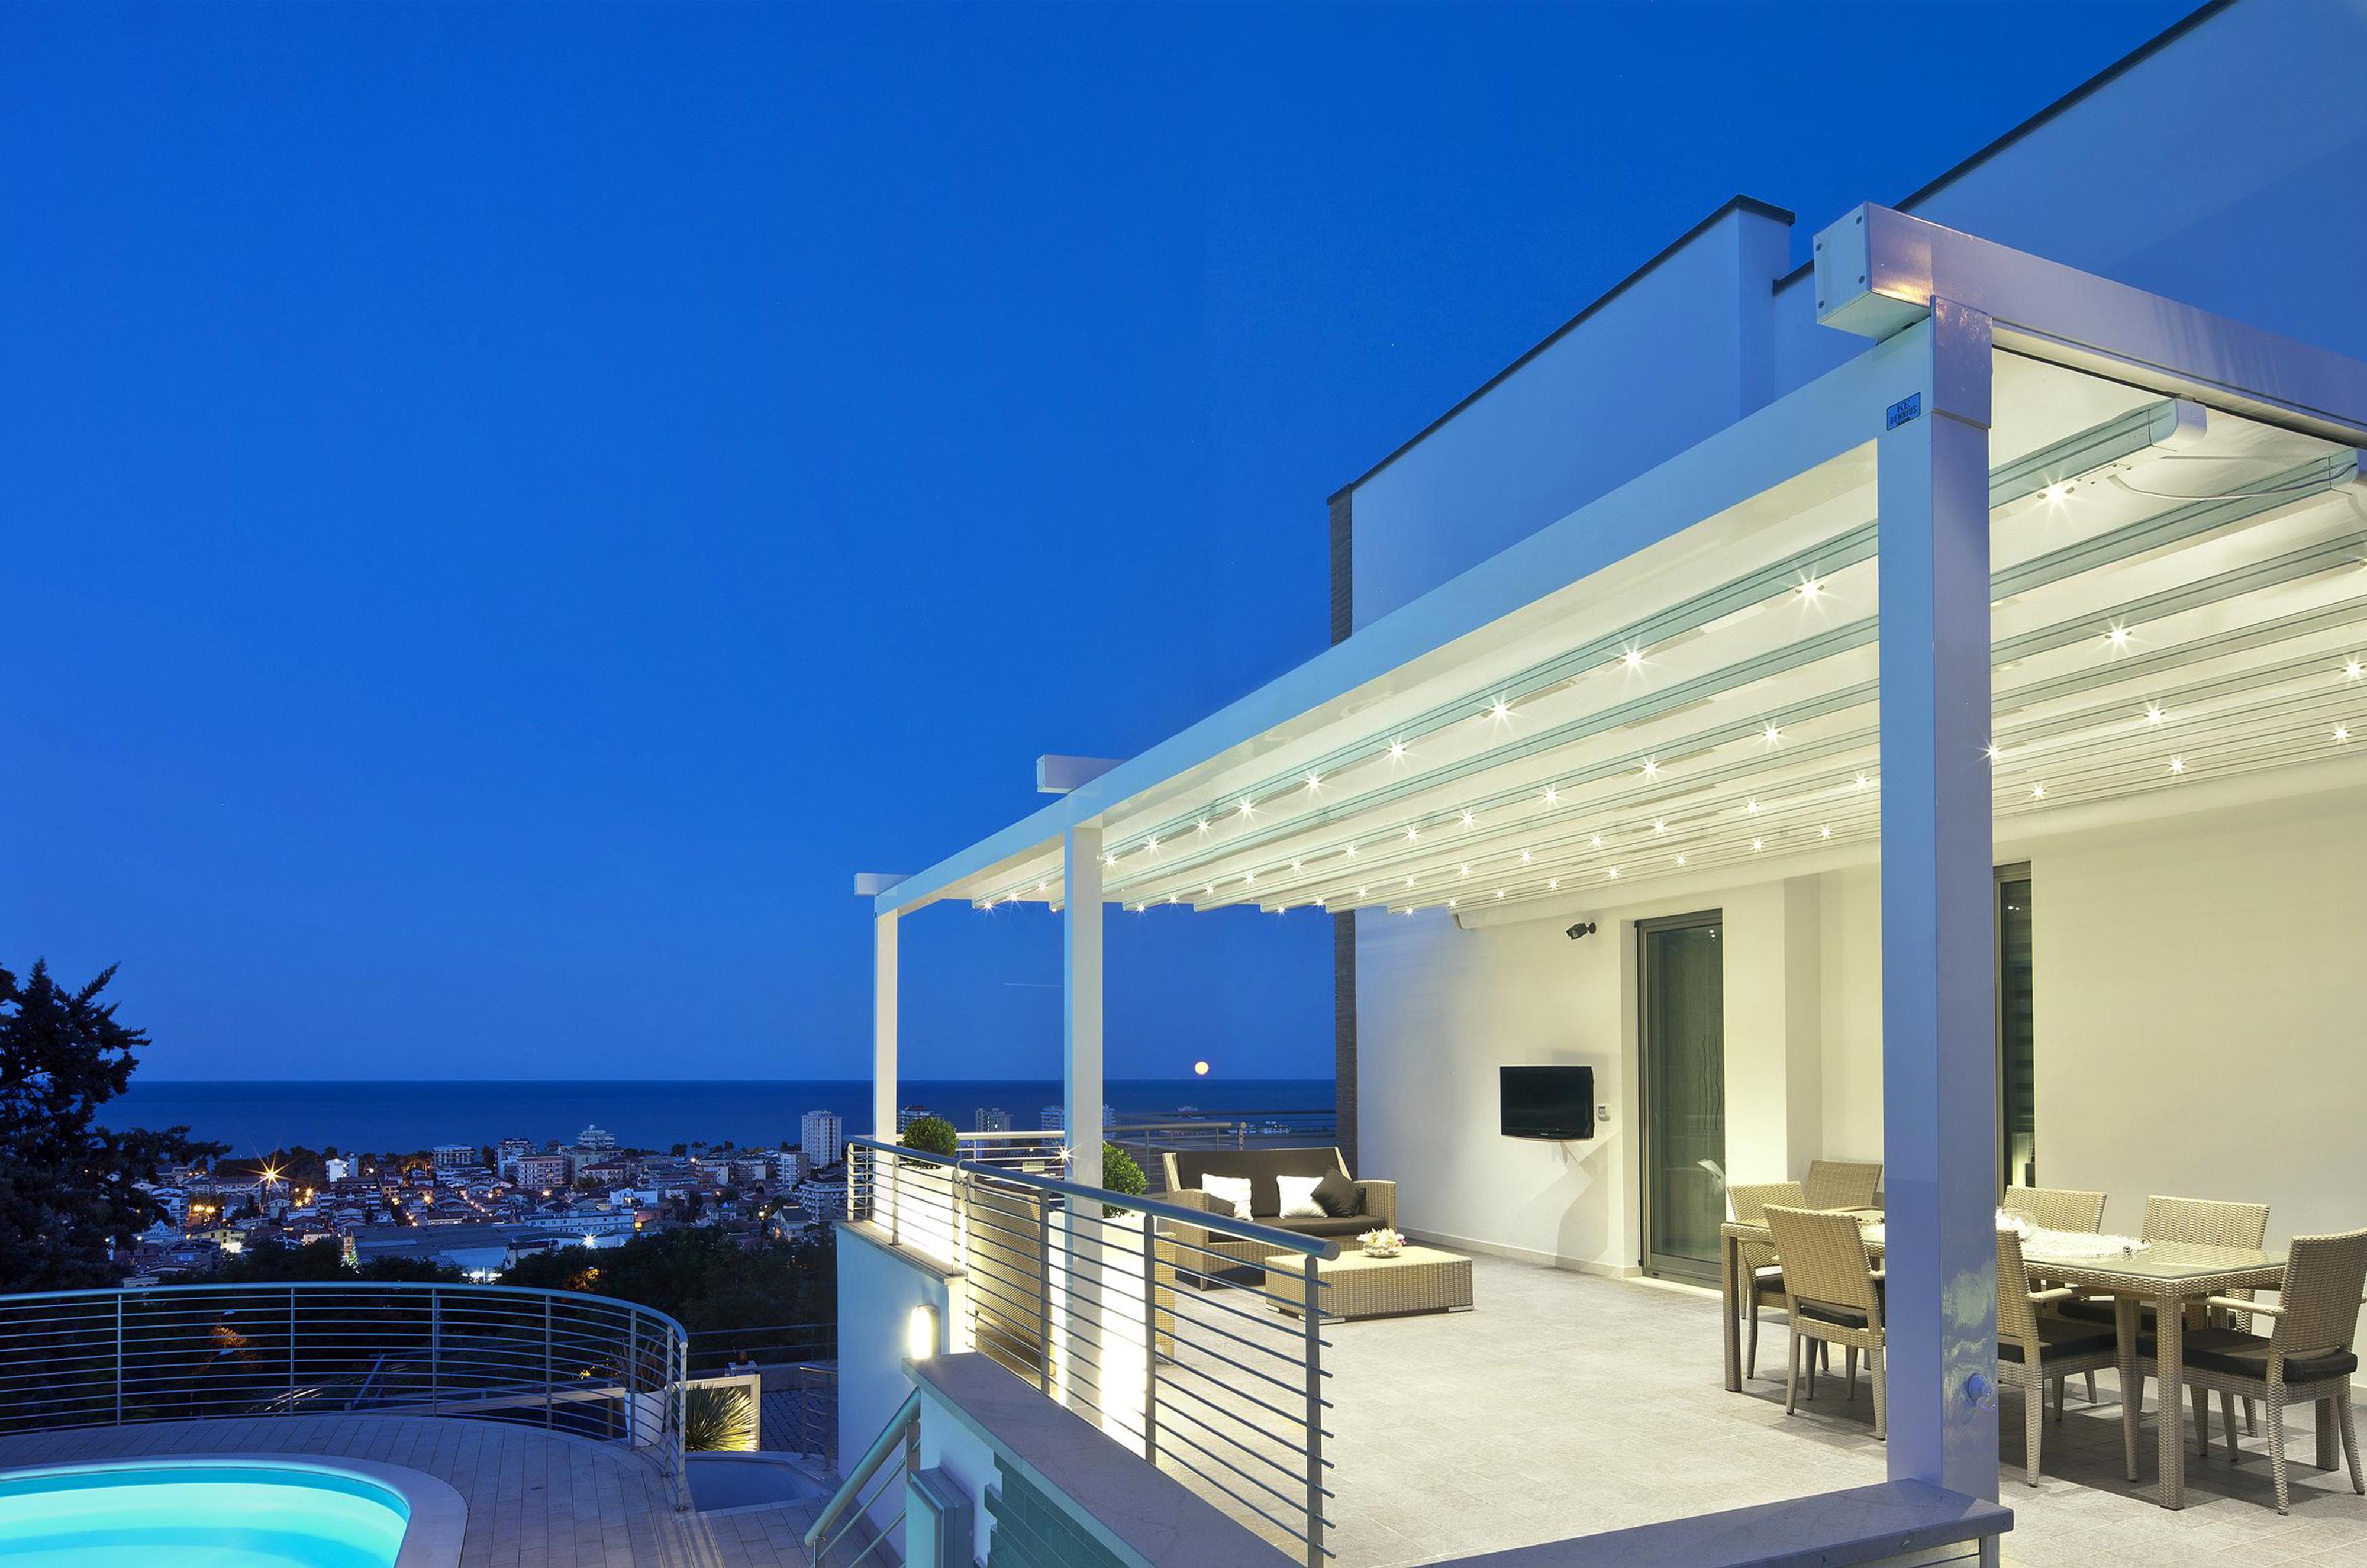 pergola v lum arc en ciel menuiserie aluminium pvc. Black Bedroom Furniture Sets. Home Design Ideas